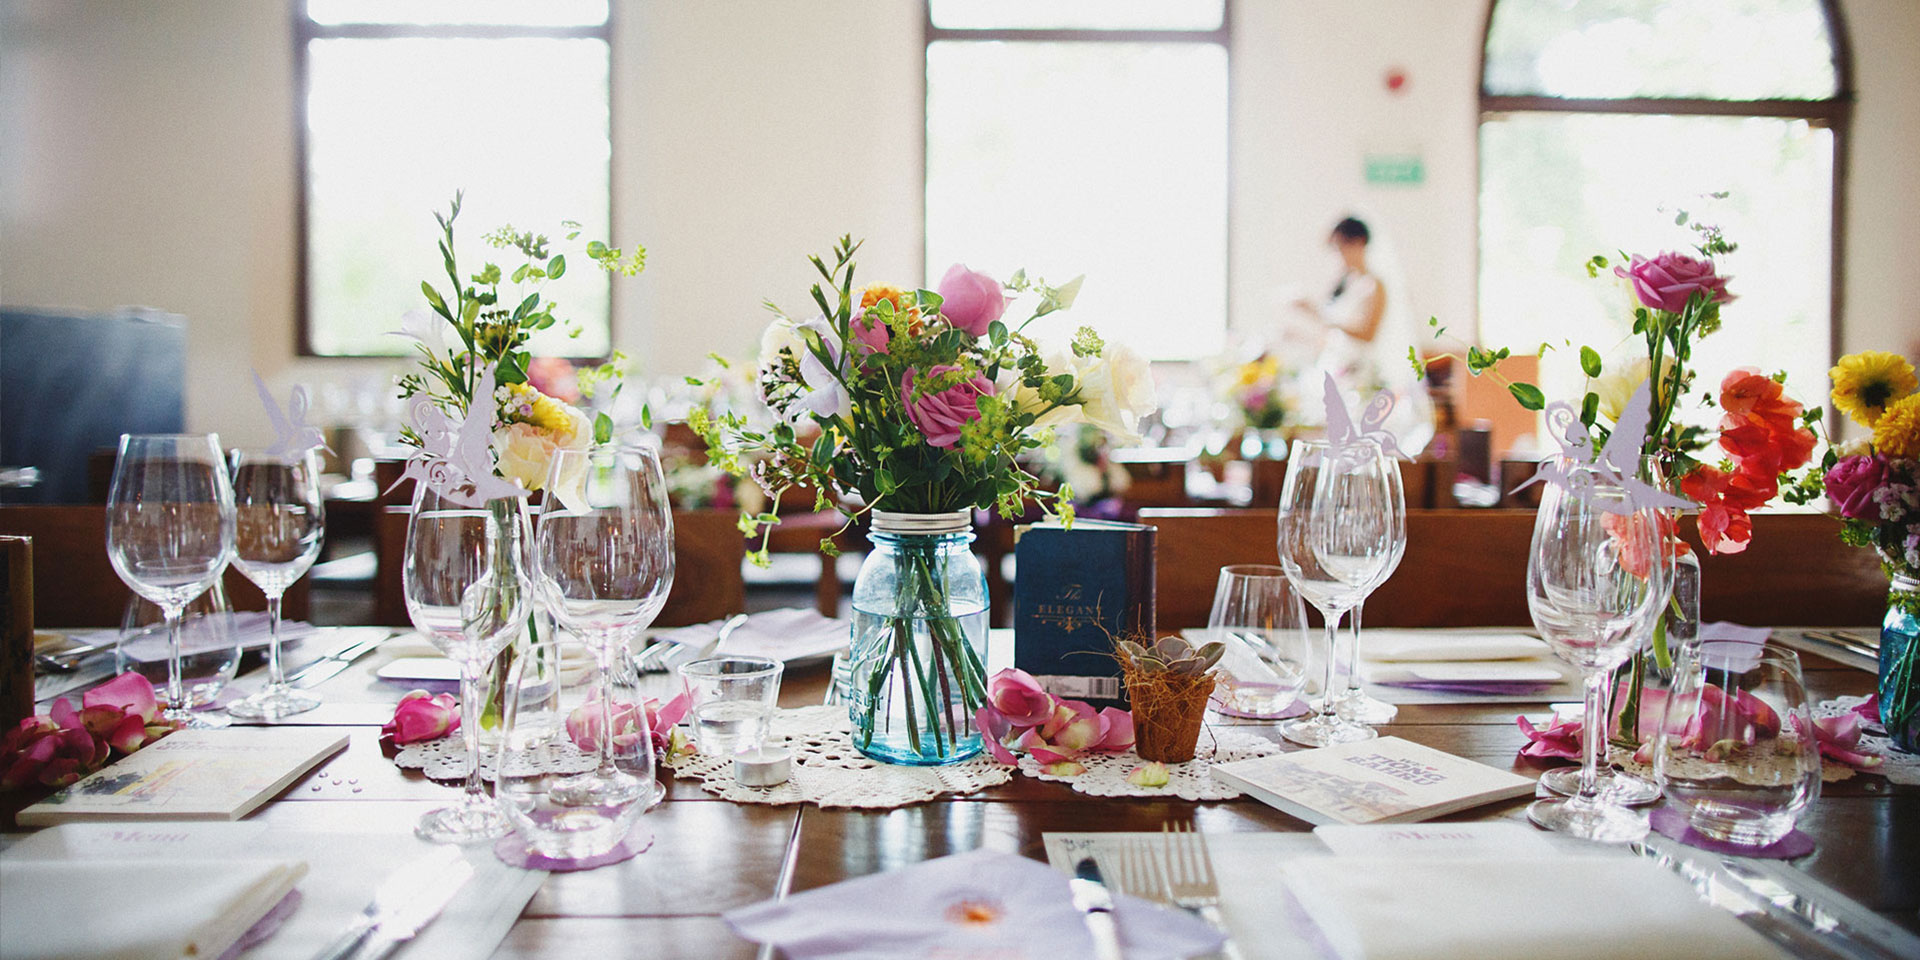 perfect-wedding-venue-singapore-venuerific-blog-the-white-rabbit-table-setup